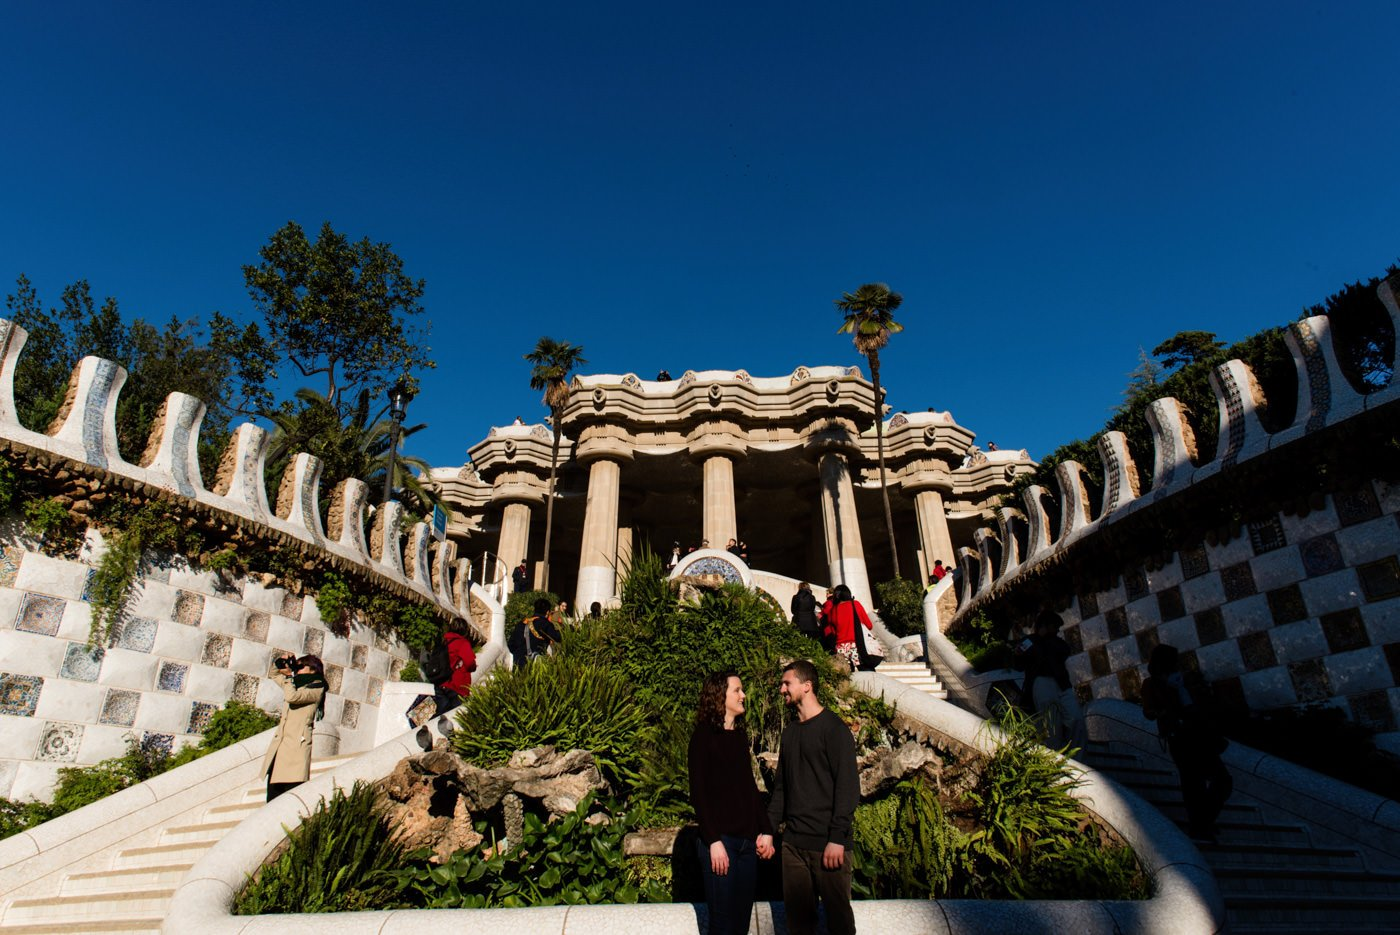 Carmel Bunkers engagement photoshoot Barcelona